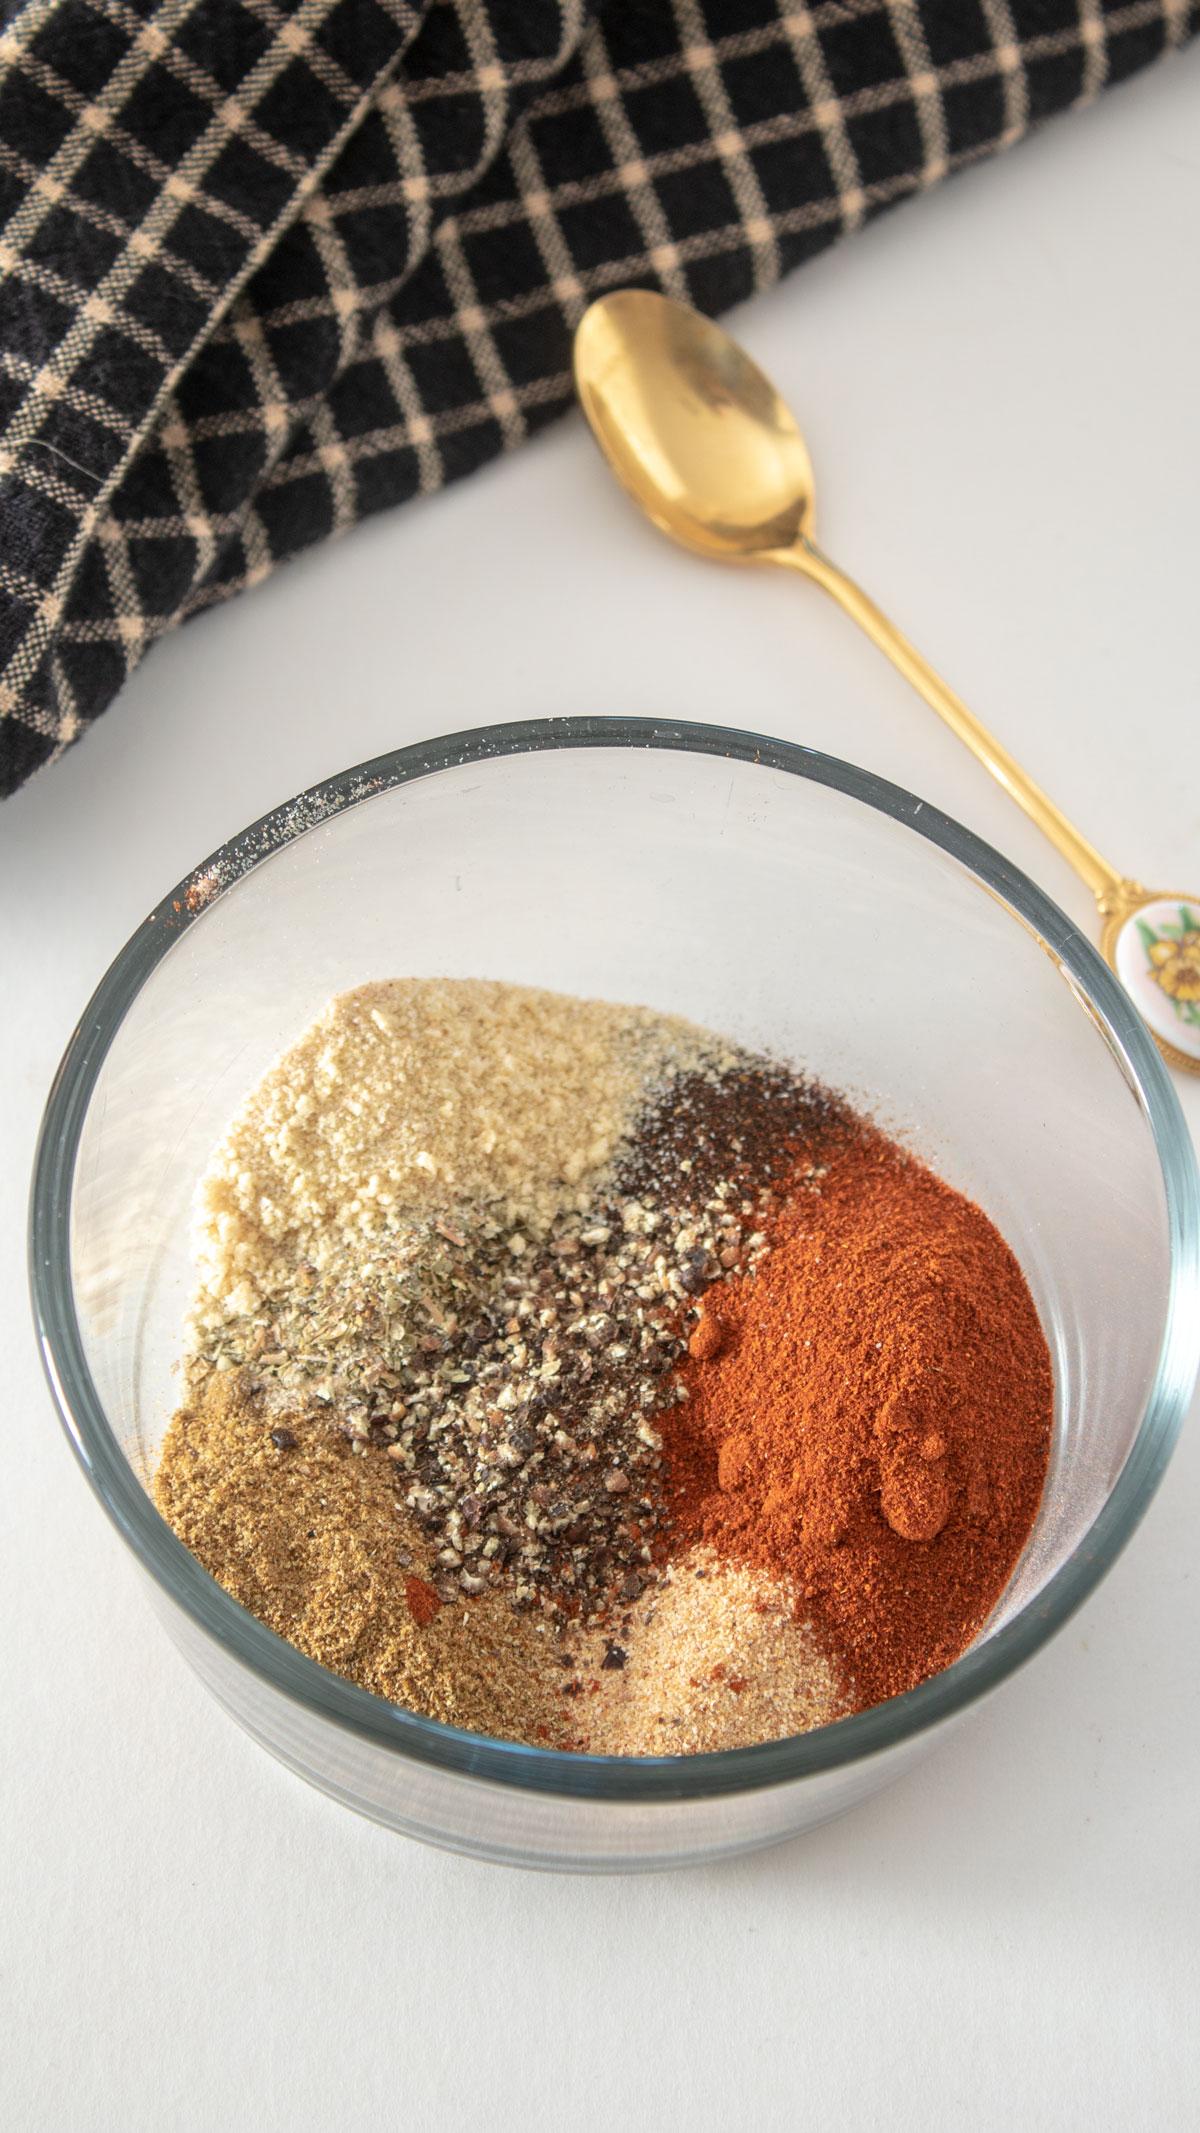 Adobo seasoning ingredients in small glass ramekins.